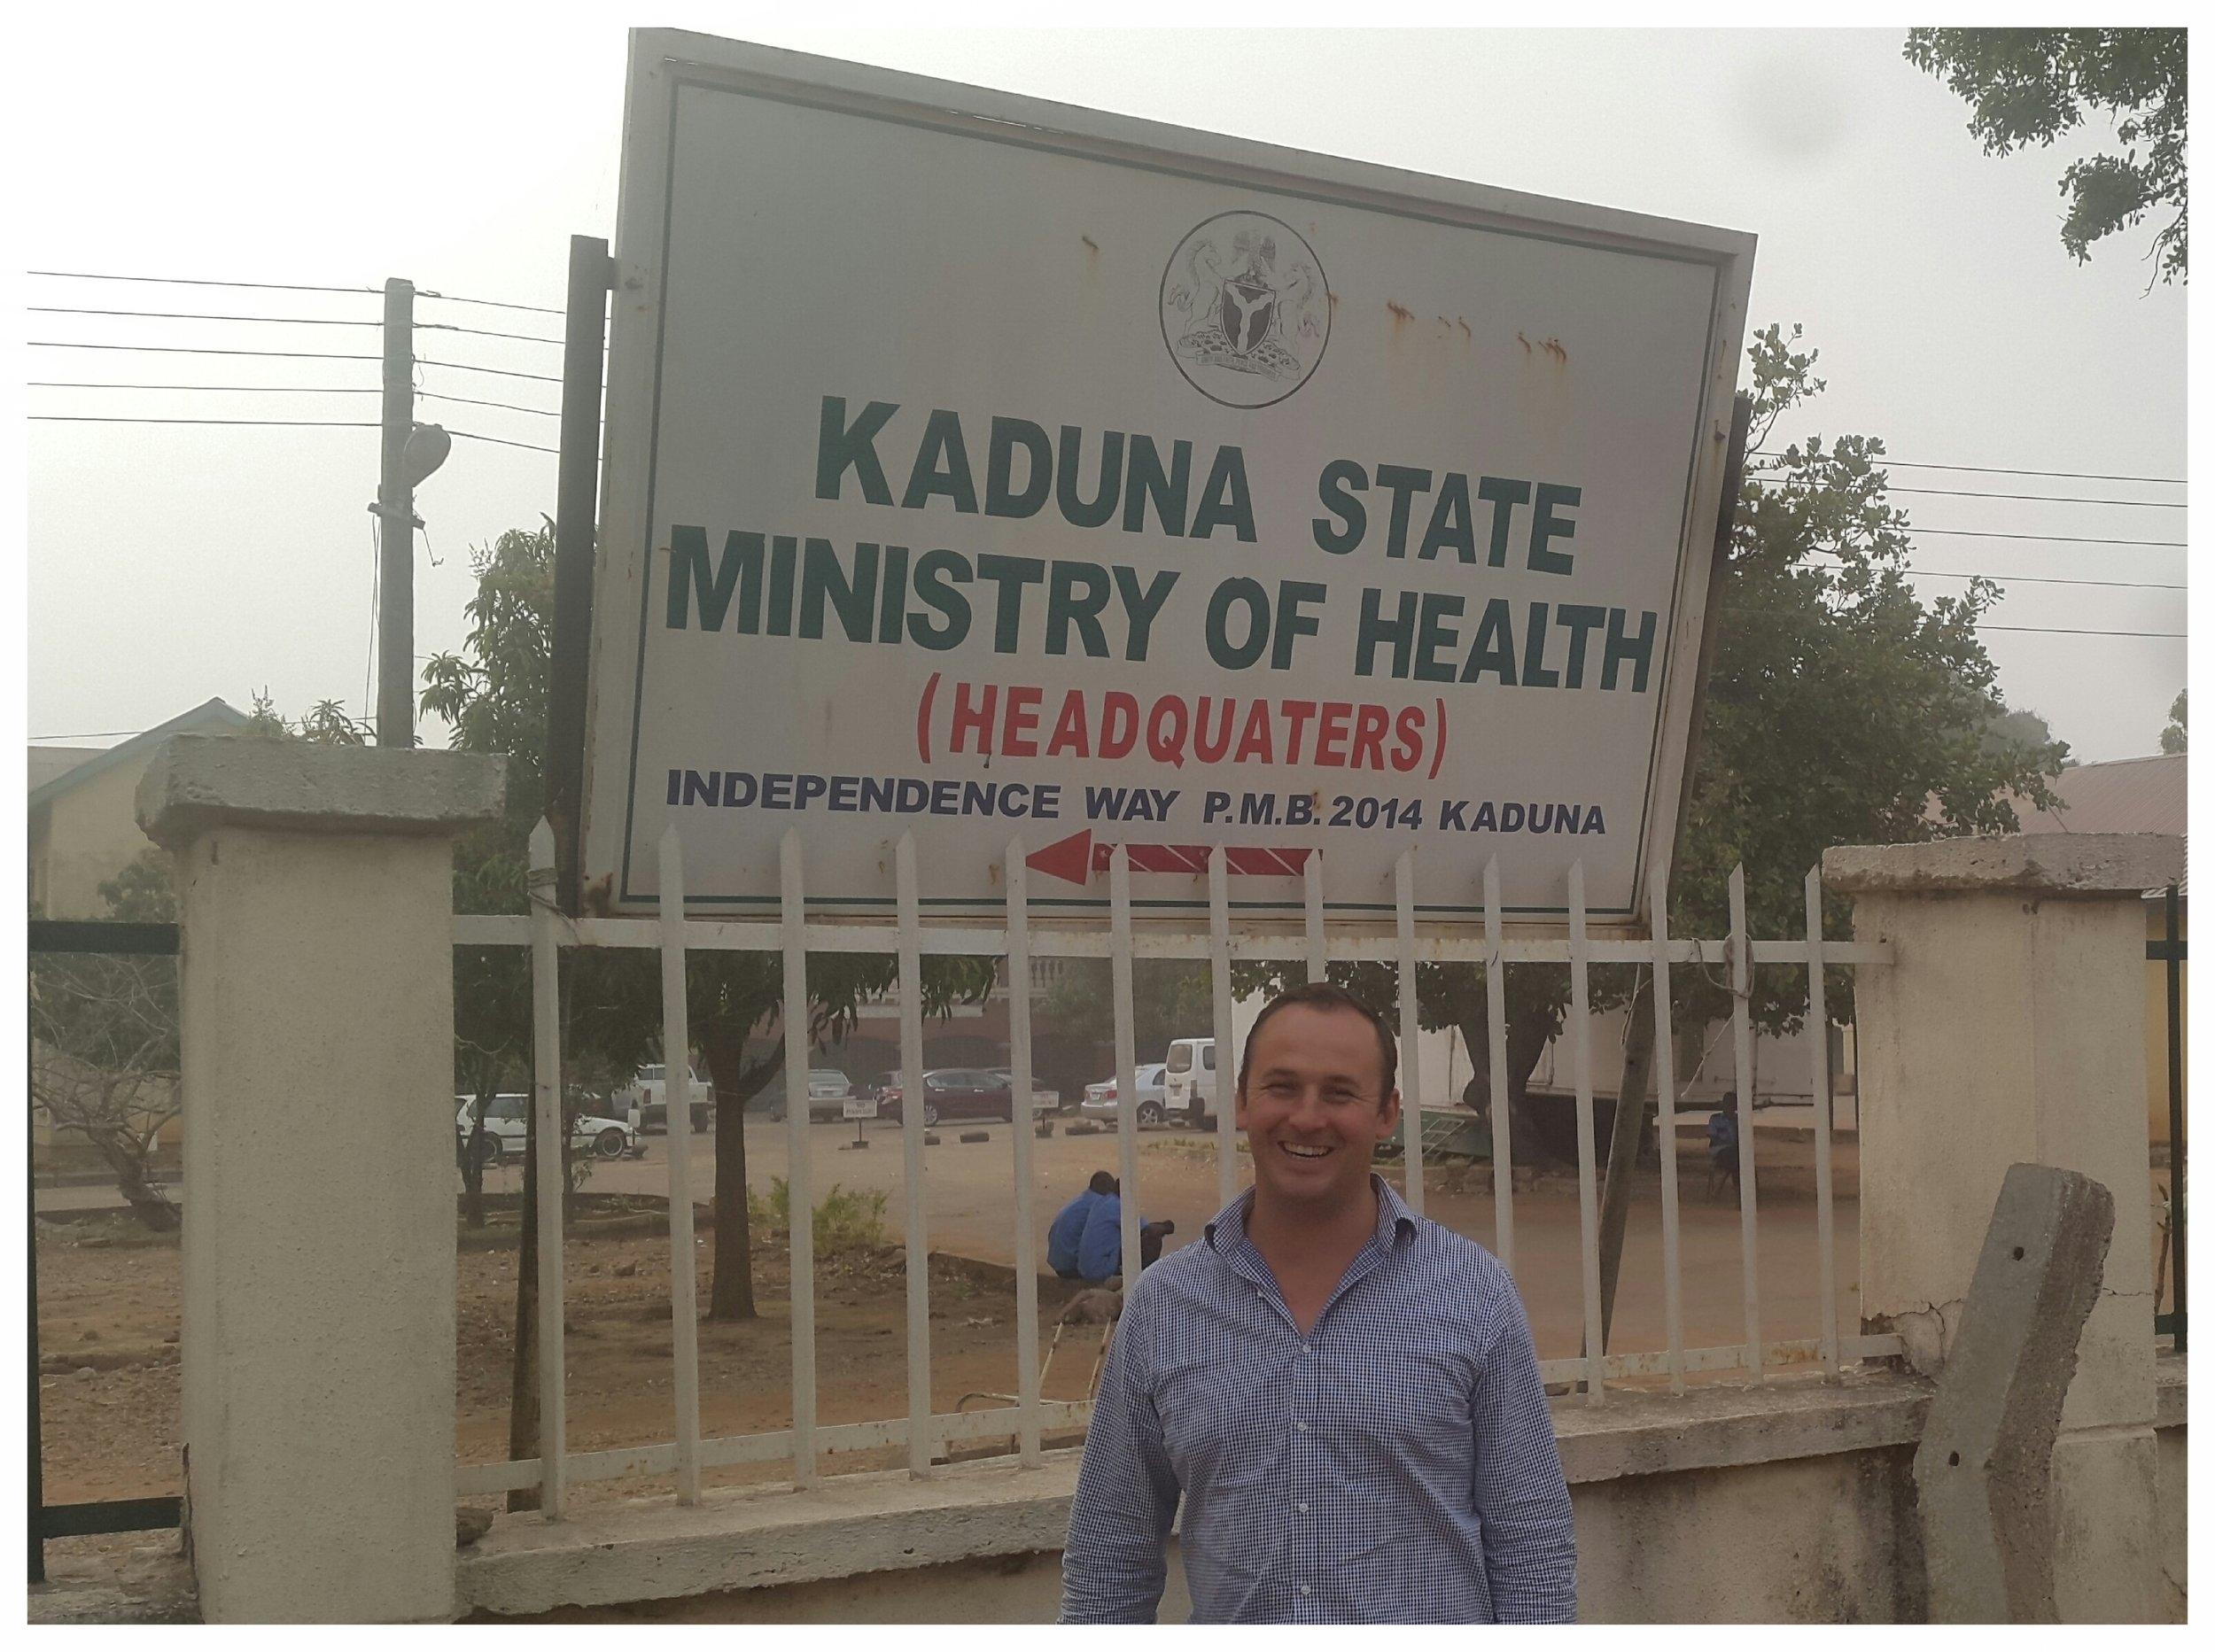 Kaduna Ministry of Health.jpg